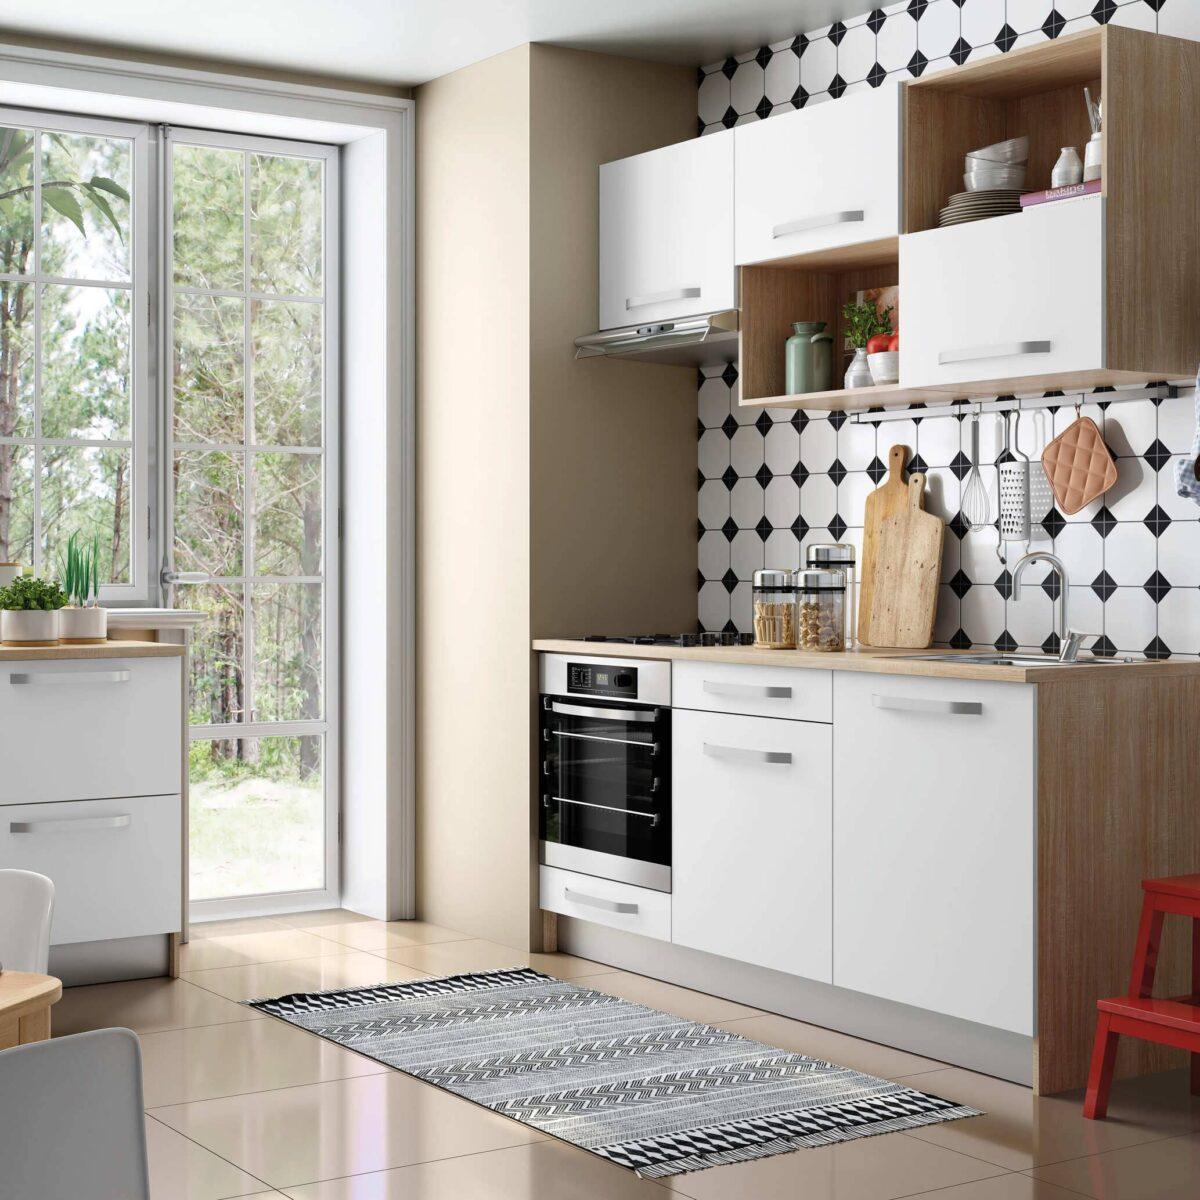 cucine-monoblocco-leroy-merlin-2